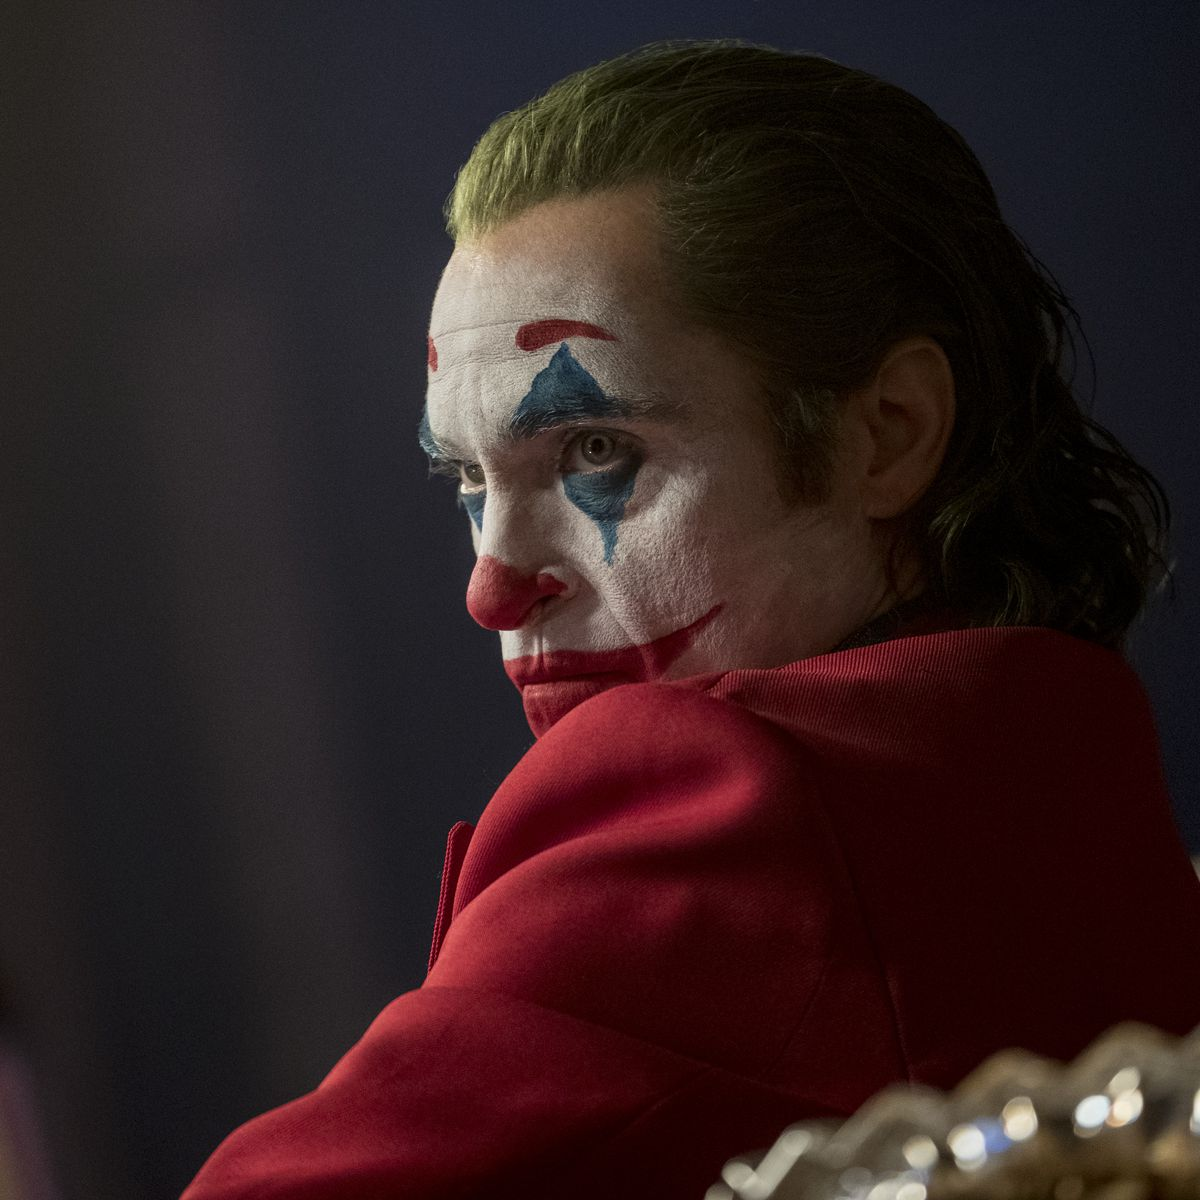 D67RACNC5BDSHH54PBIGWATIA4 The 20 Biggest Ways Joker Breaks the Superhero Mold